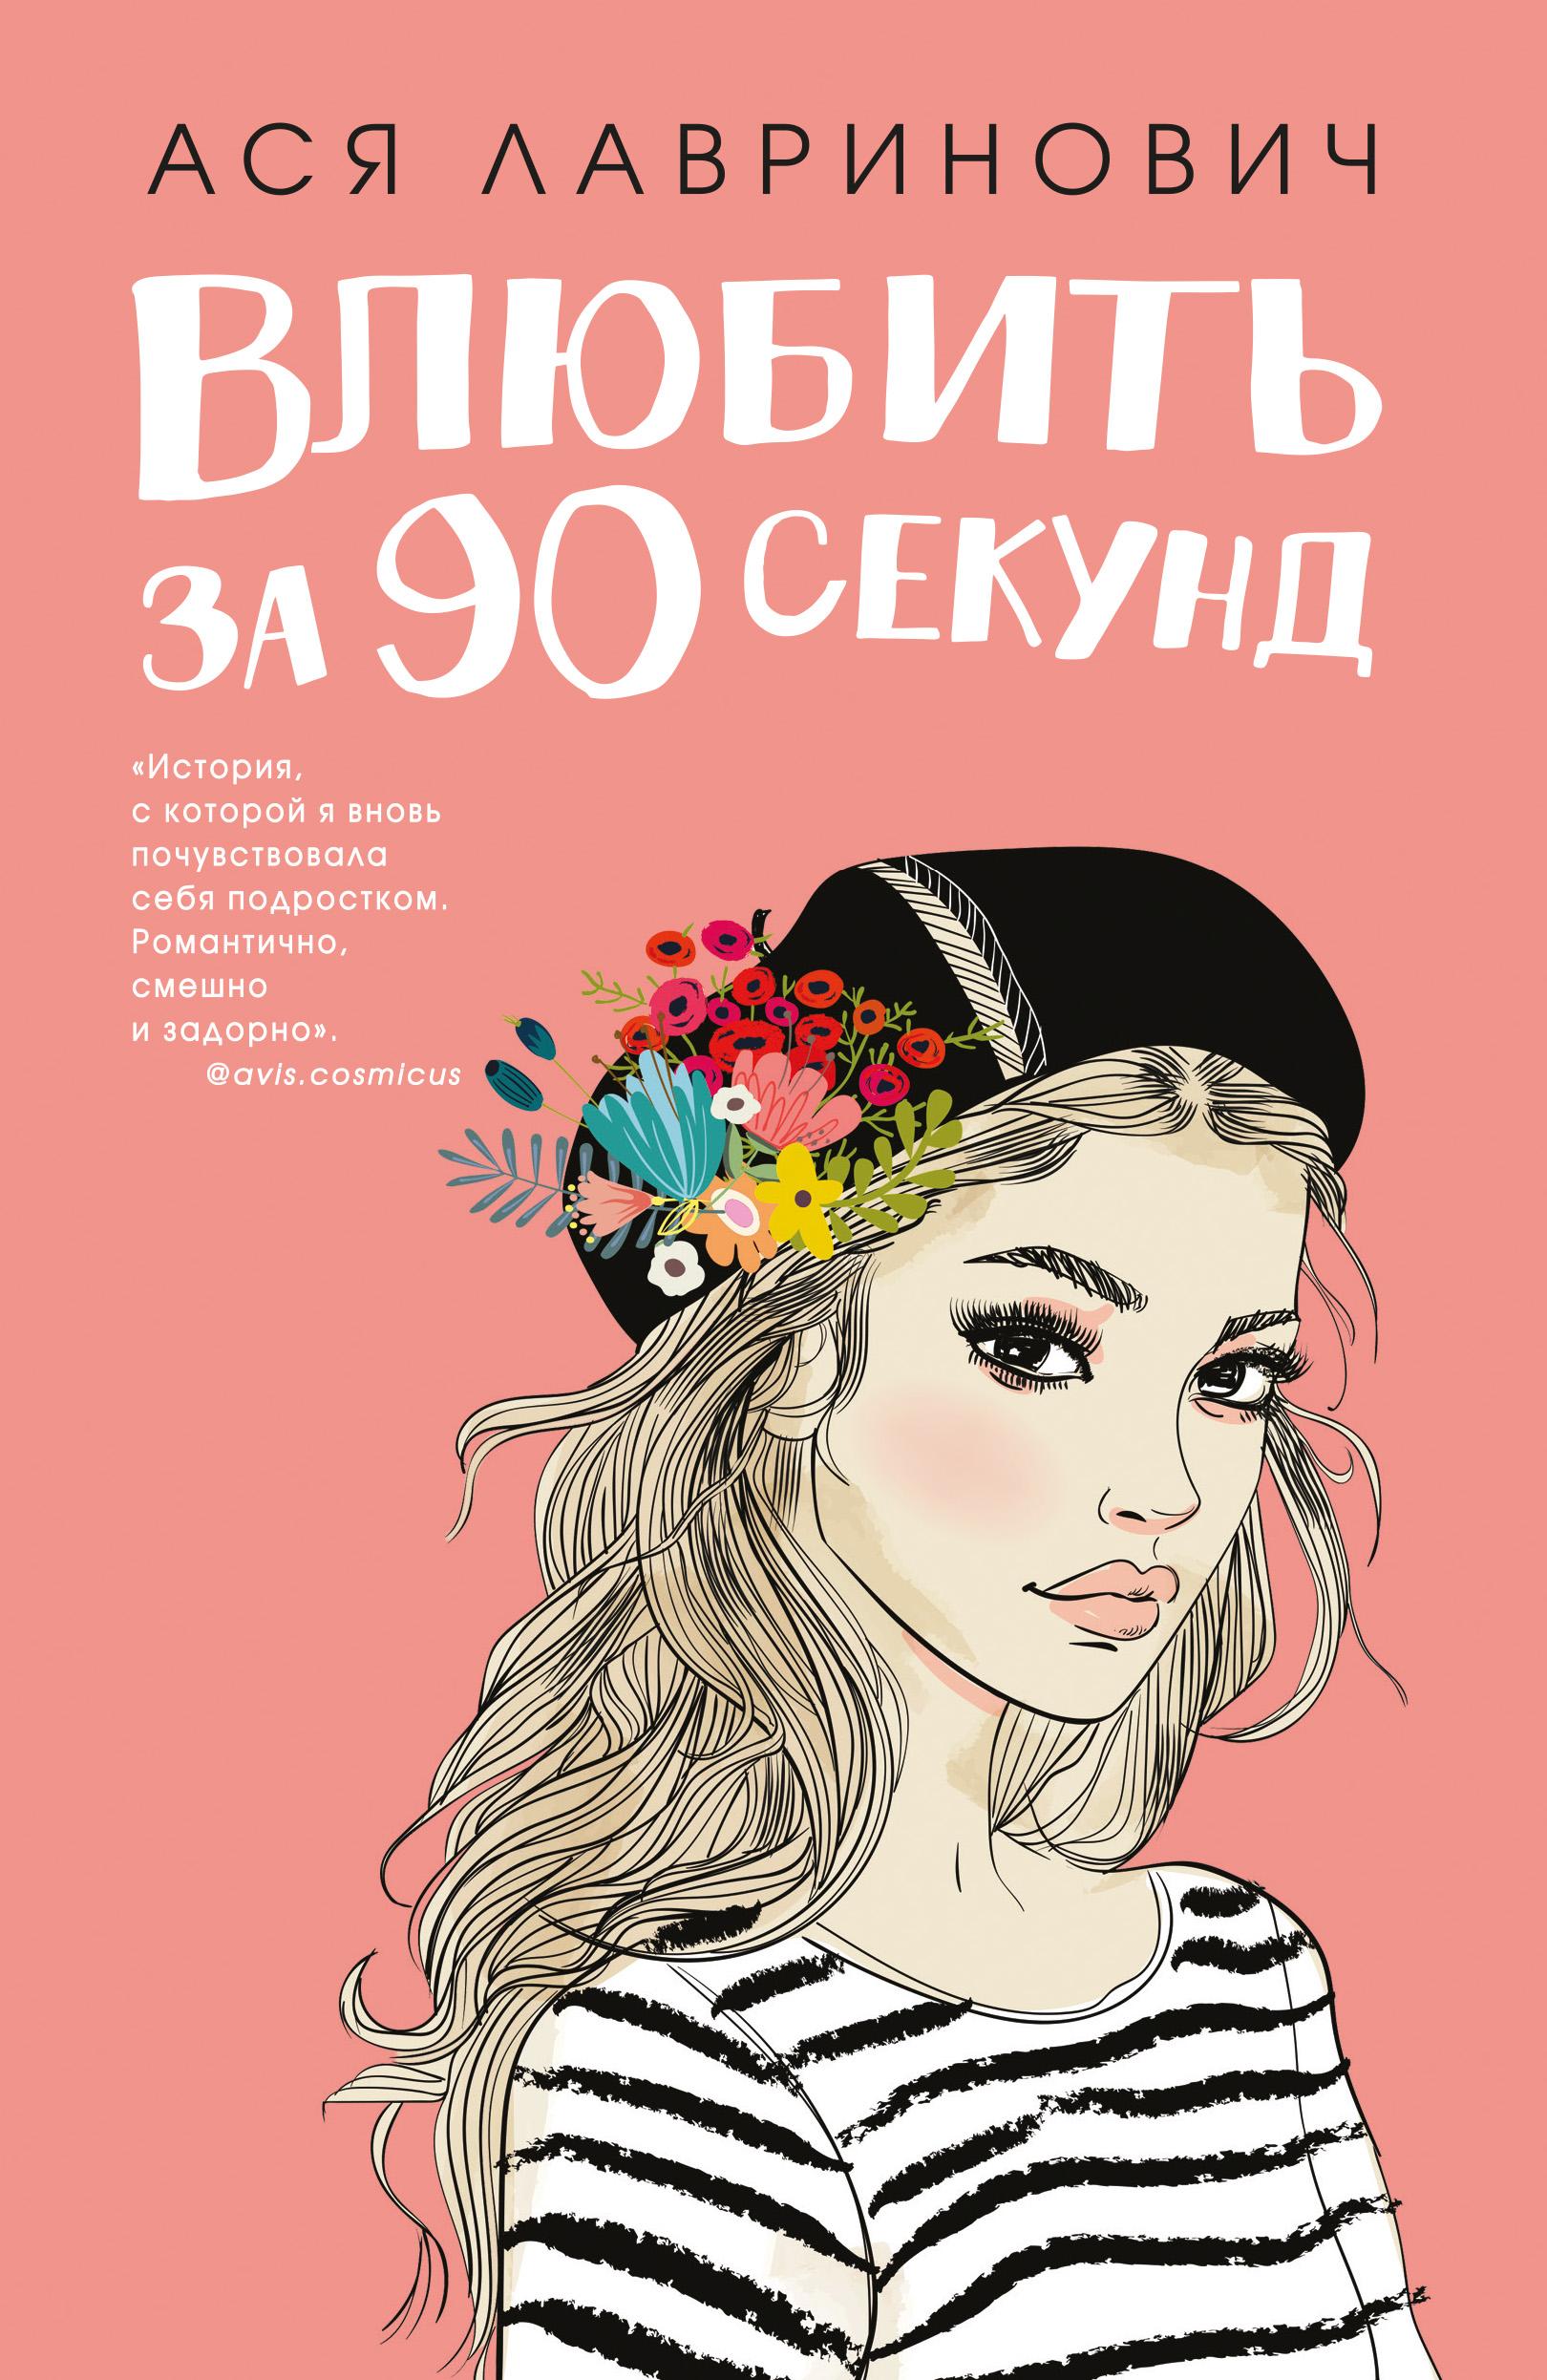 Ася Лавринович, Влюбить за 90 секунд – читать онлайн полностью ...